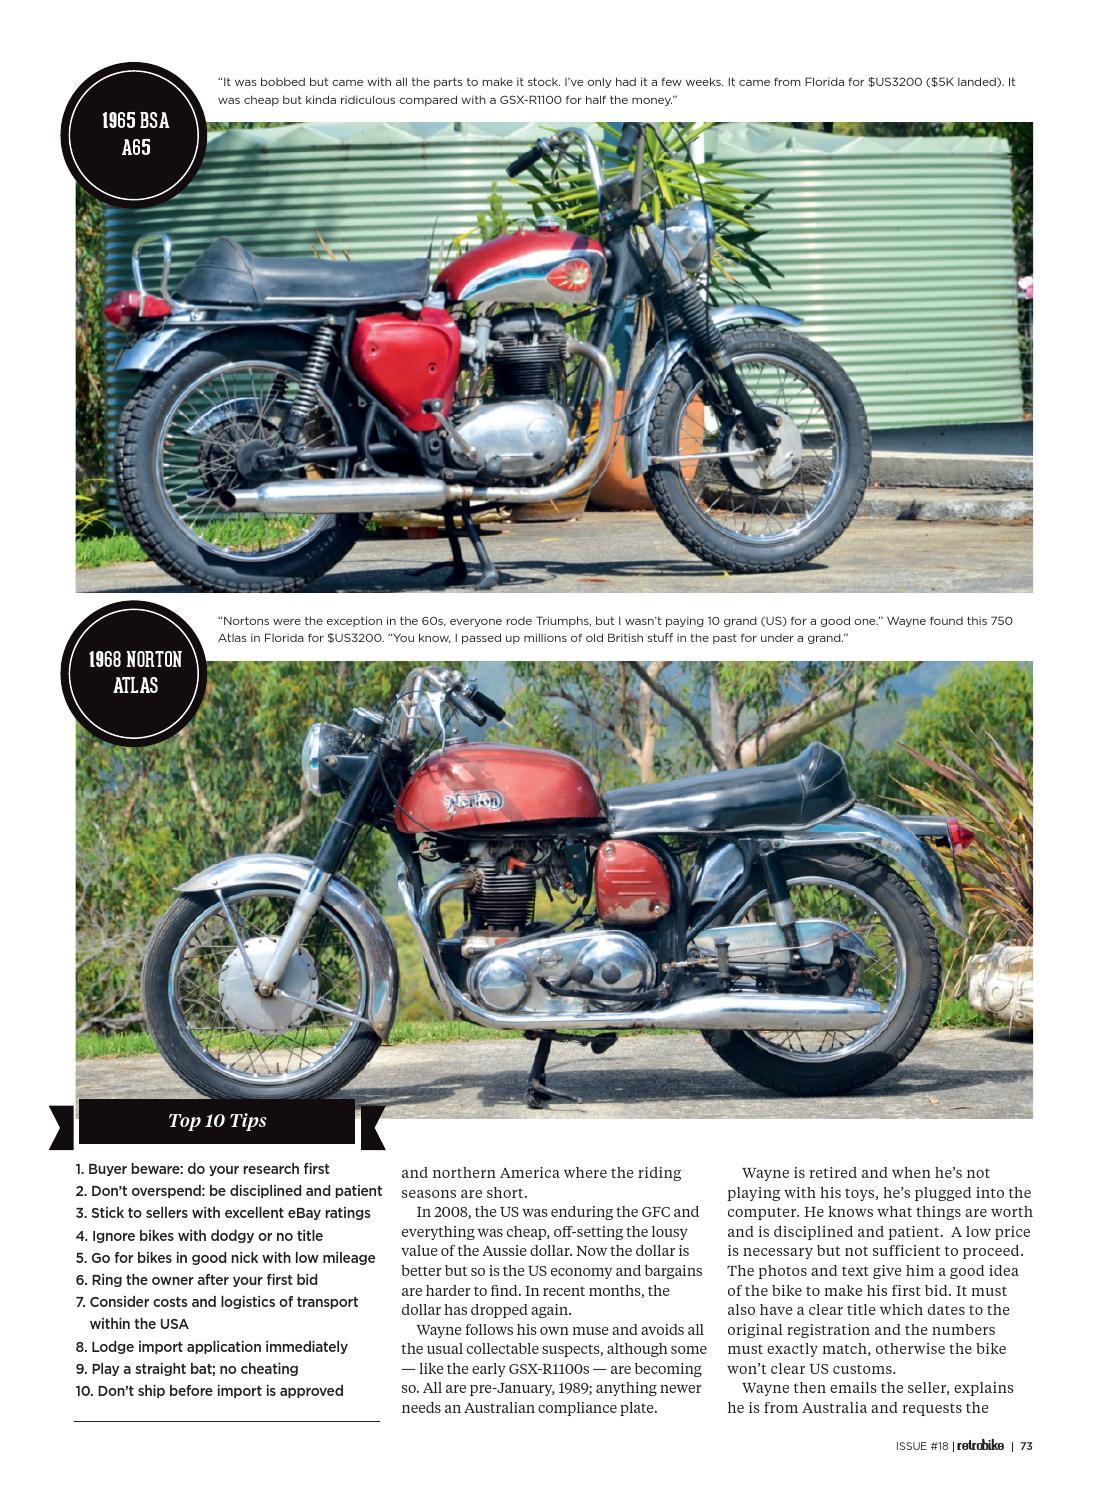 Retro Bike Issue #18